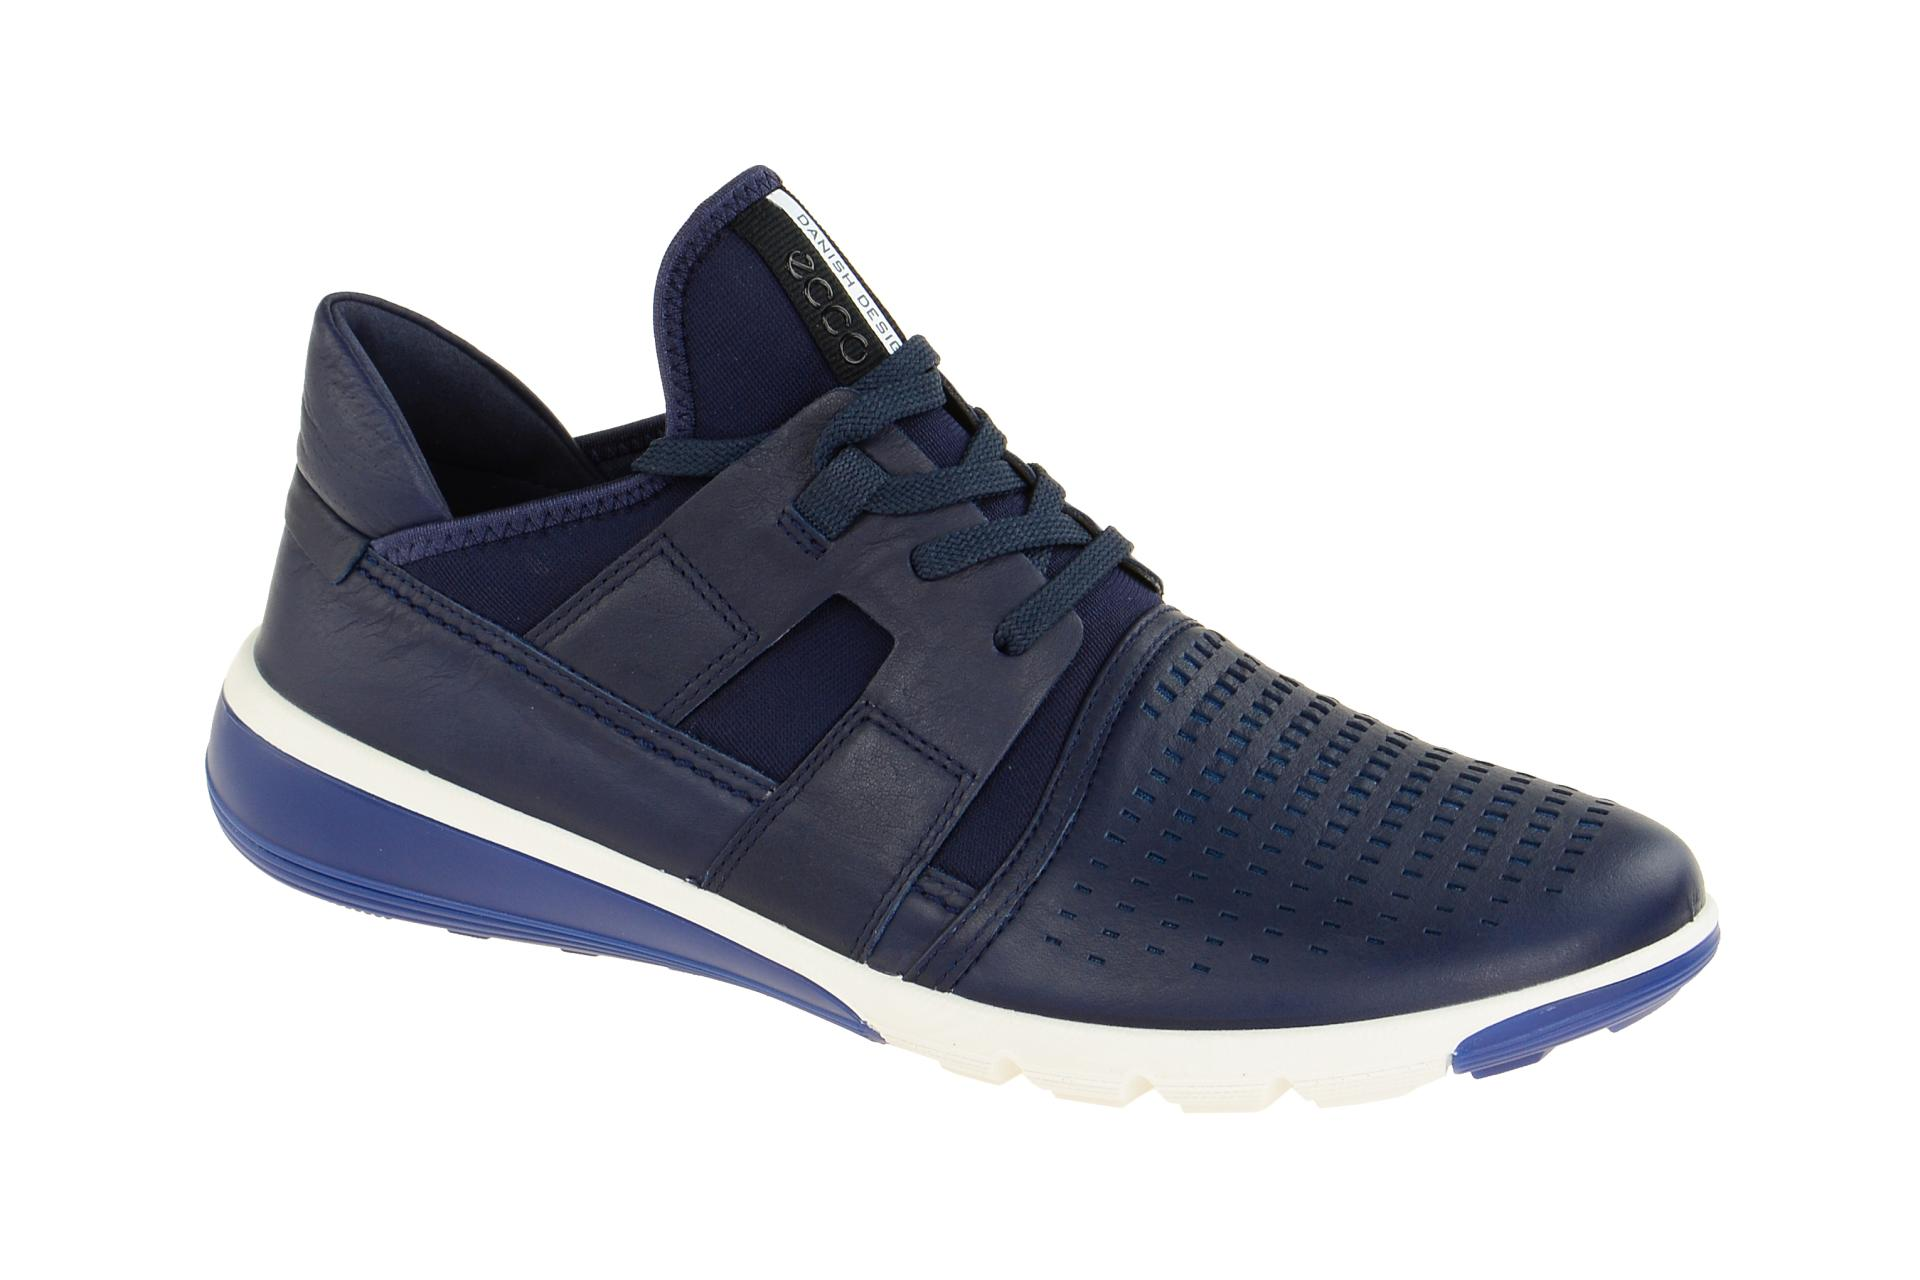 05f5285bdc9d00 Ecco Intrinsic blau 86059458960 - Schuhhaus Strauch Shop